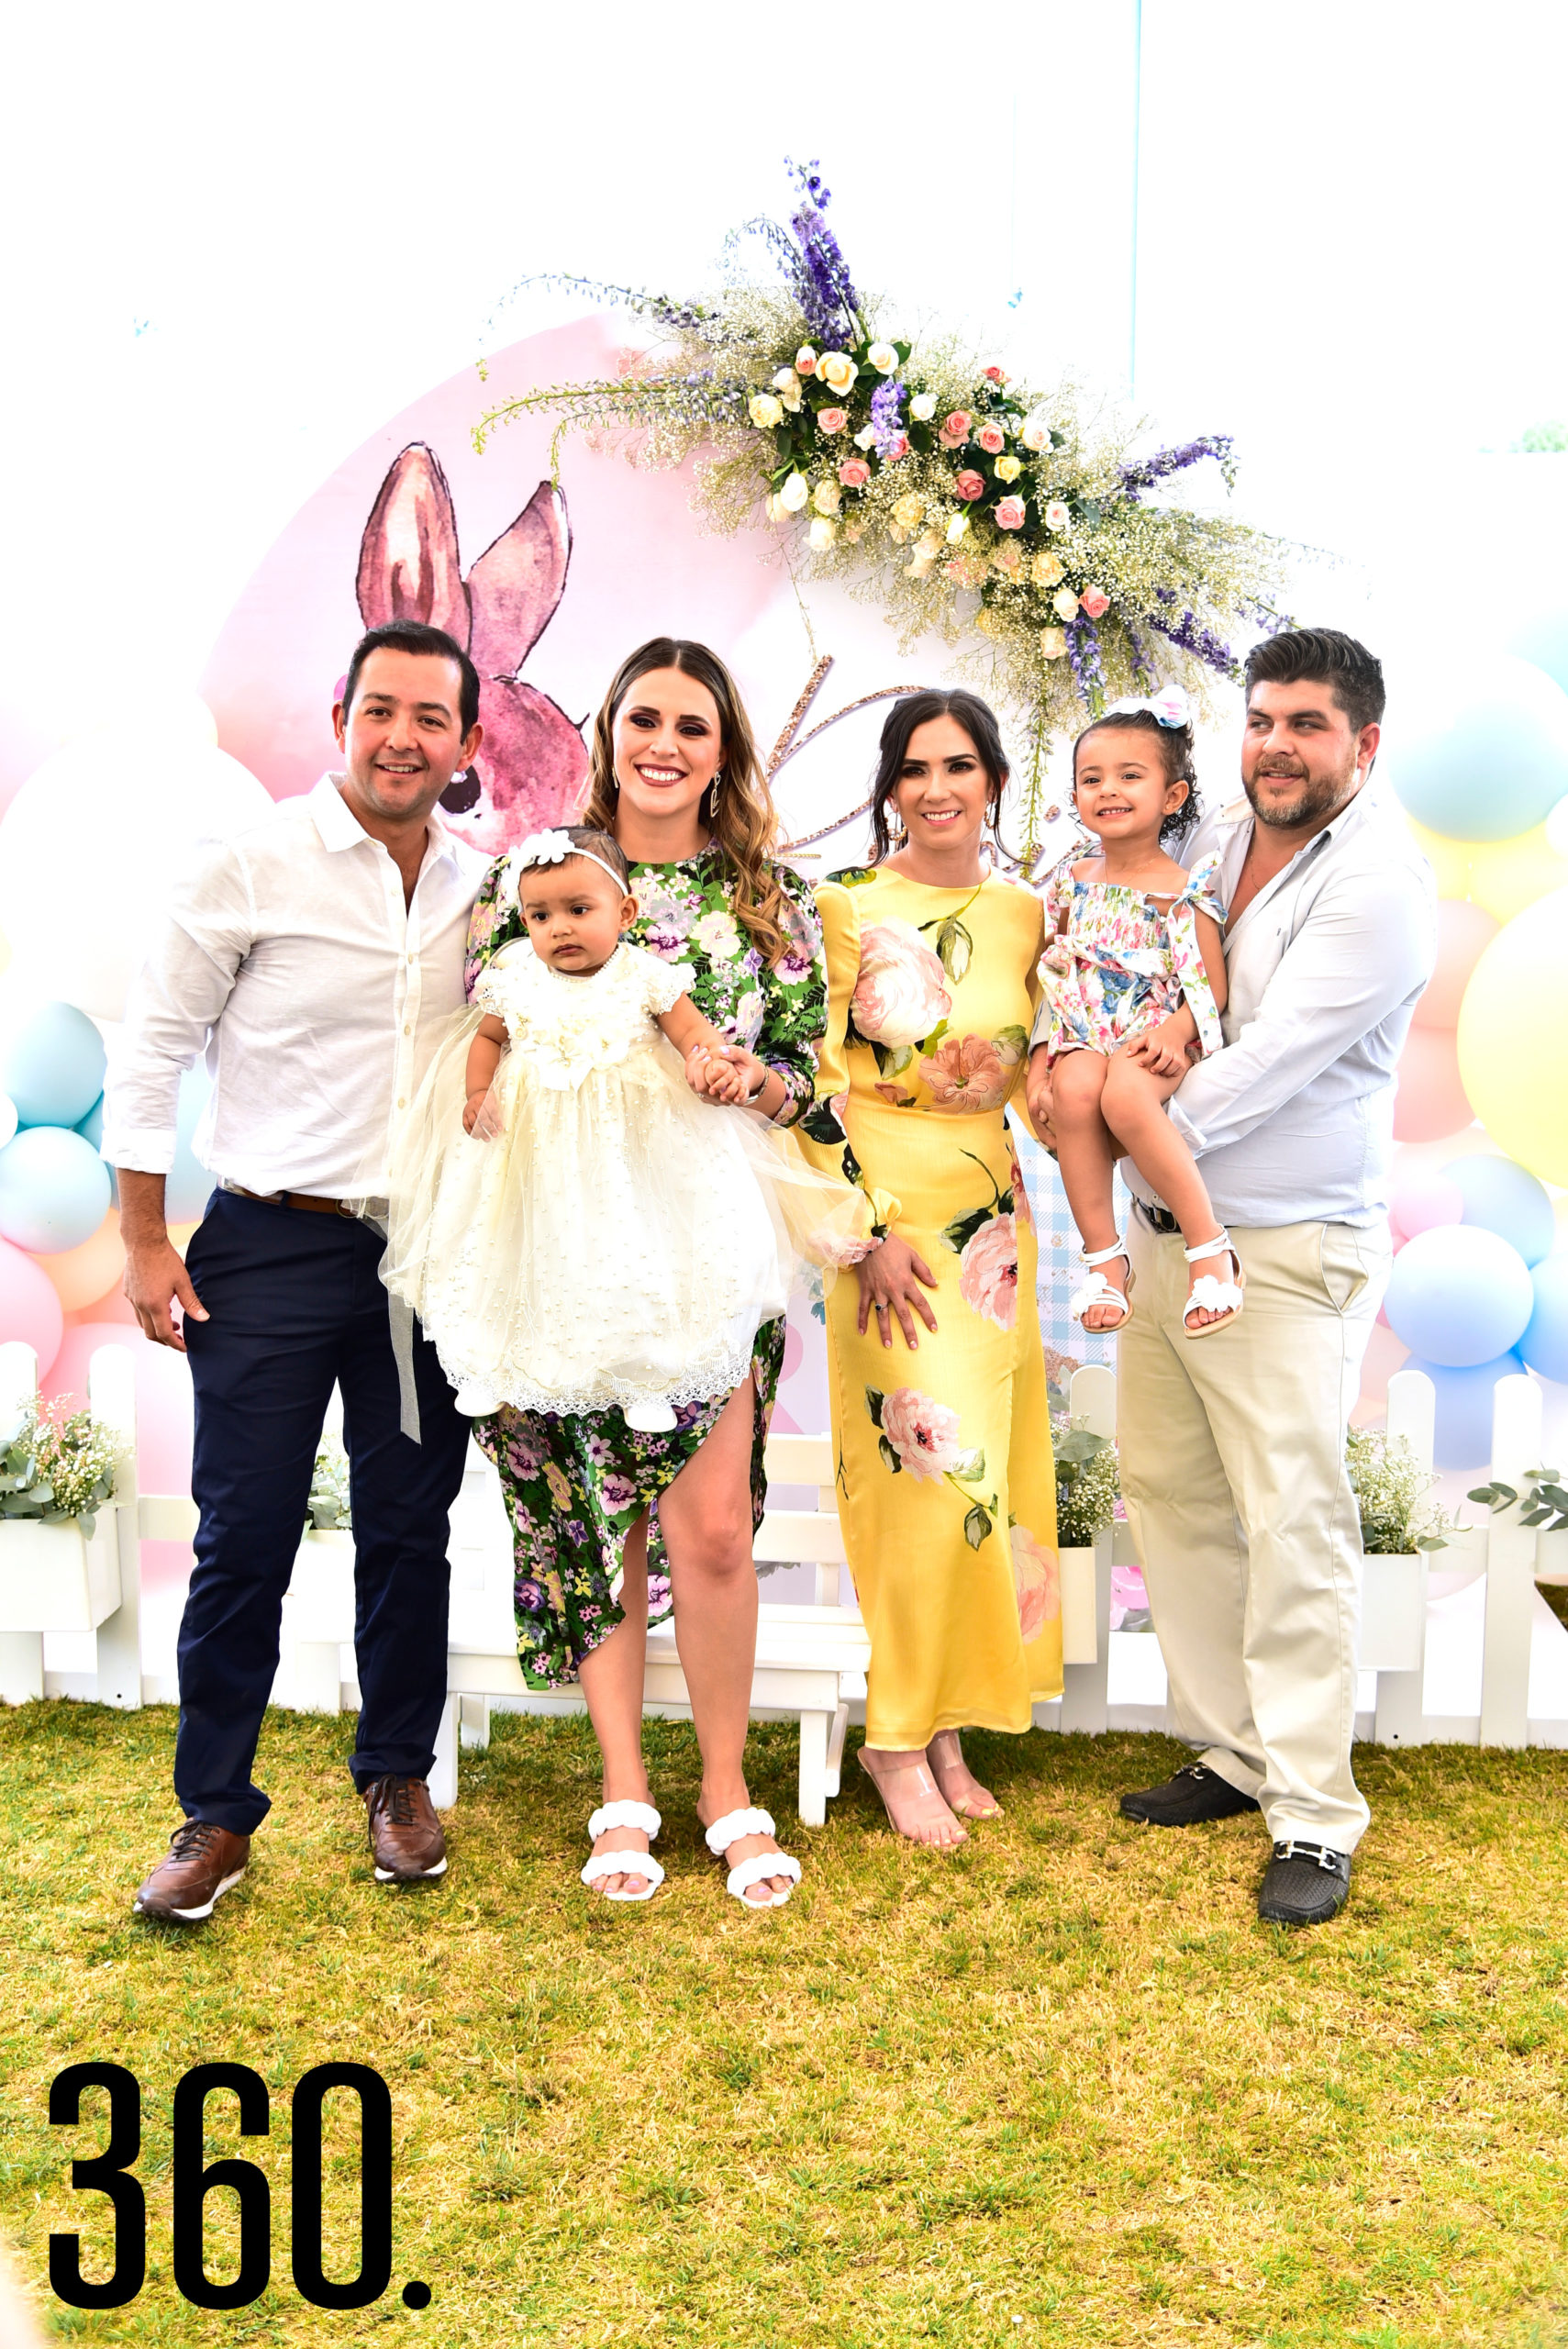 Luis Perez, Romina Perez, Cristina Davila, Mauro Garza, Alicia Jiménez y su hermana Cristy Pérez Dávila.